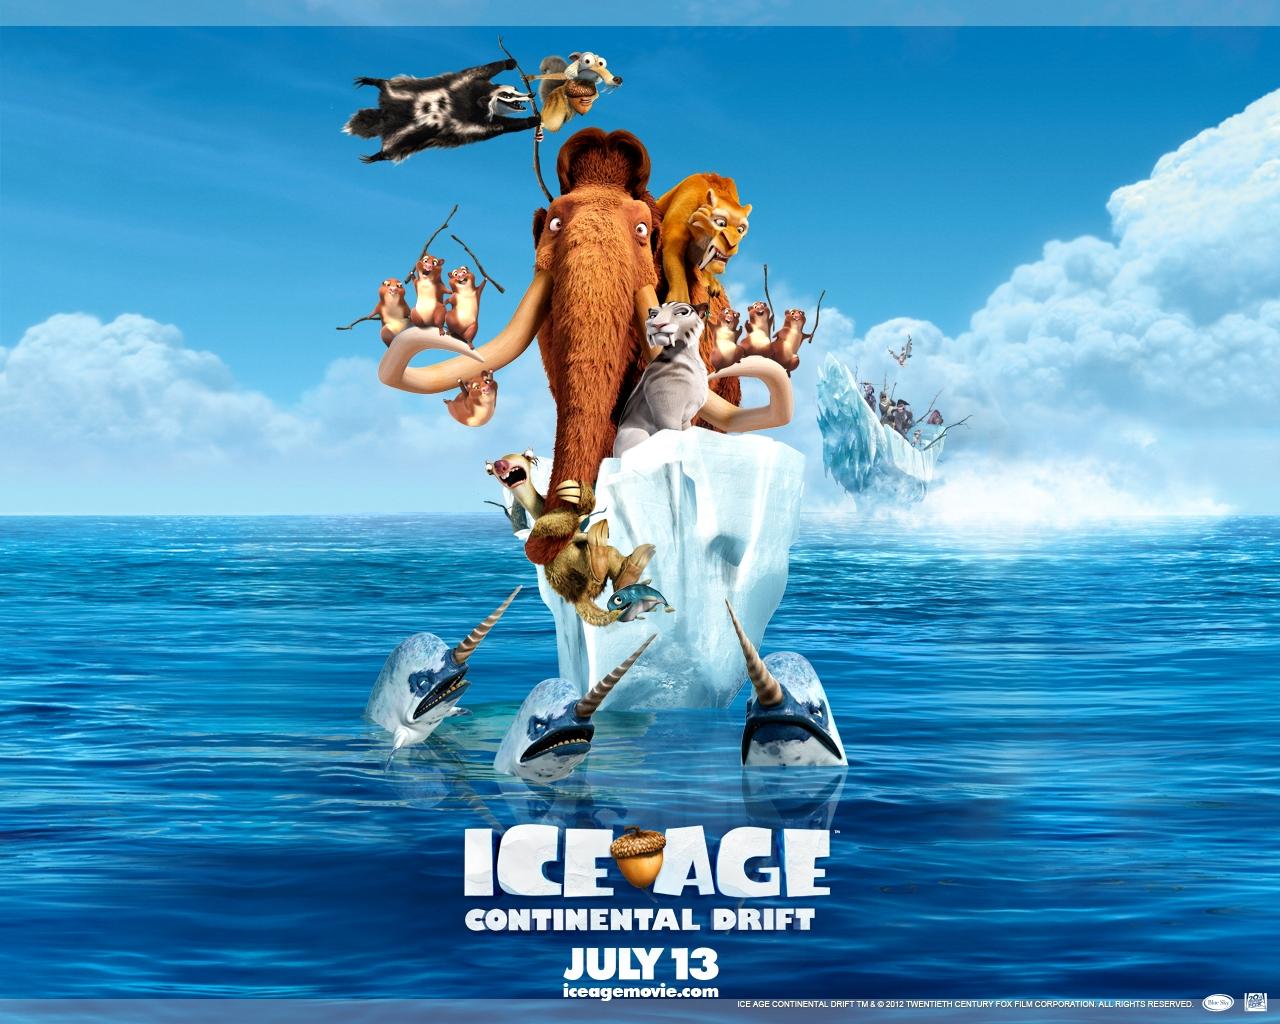 http://4.bp.blogspot.com/-NepBIaEHqVE/UOV_5JhvjdI/AAAAAAAAMOI/r_d8otbcPy0/s1600/ice+age+continental+drift+movie+wallpaper+3.jpg